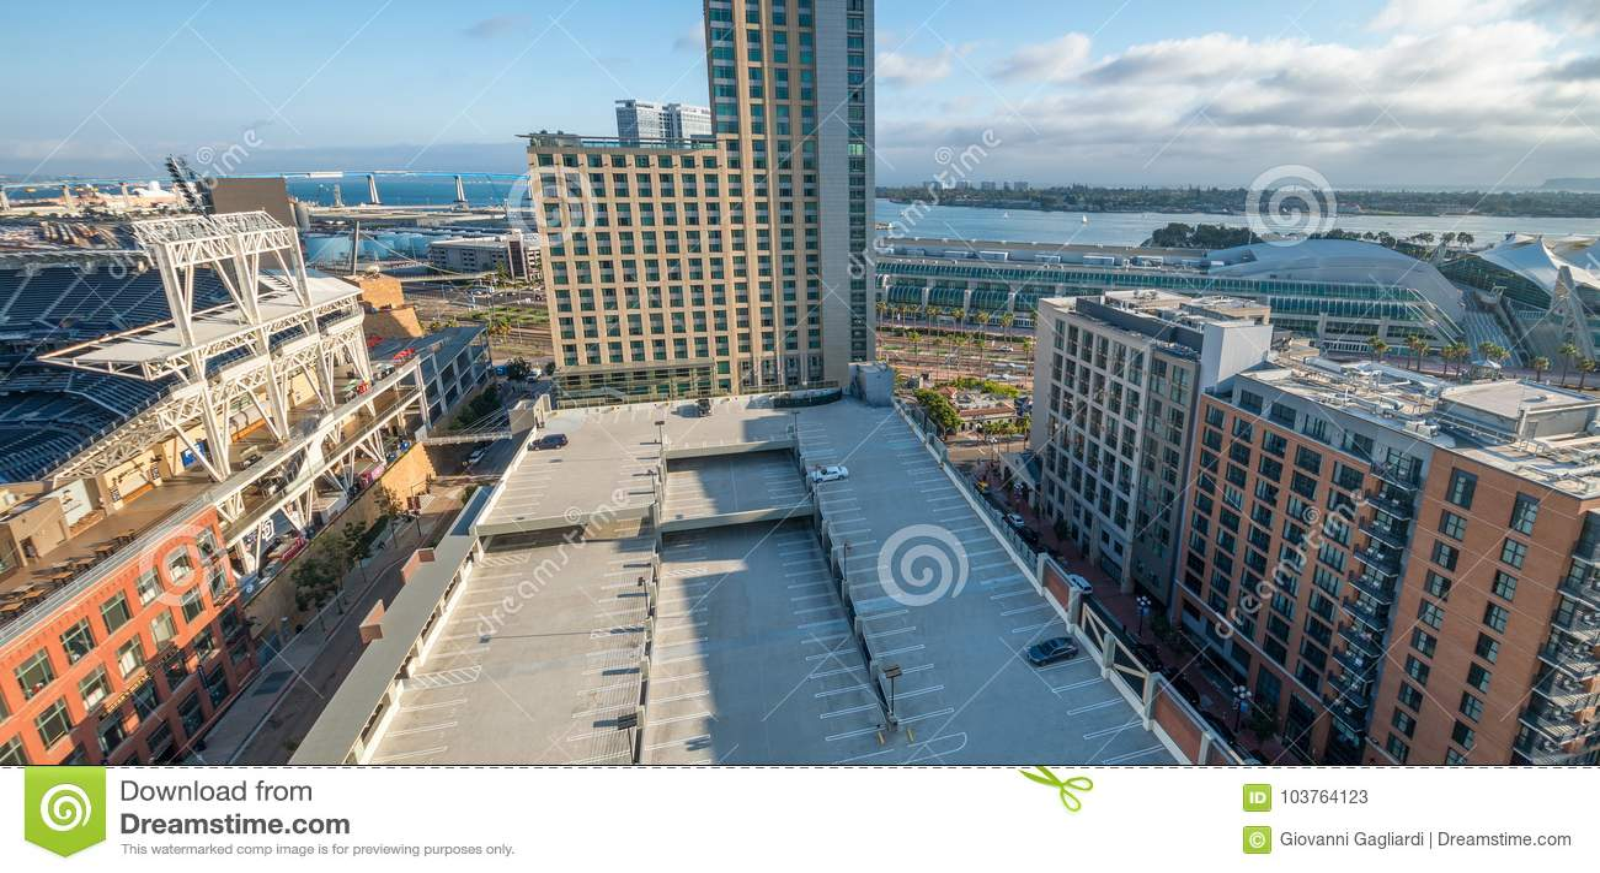 SAN DIEGO - JULY 29, 2017: Modern city skyline. San Diego attracts 20 million people annually